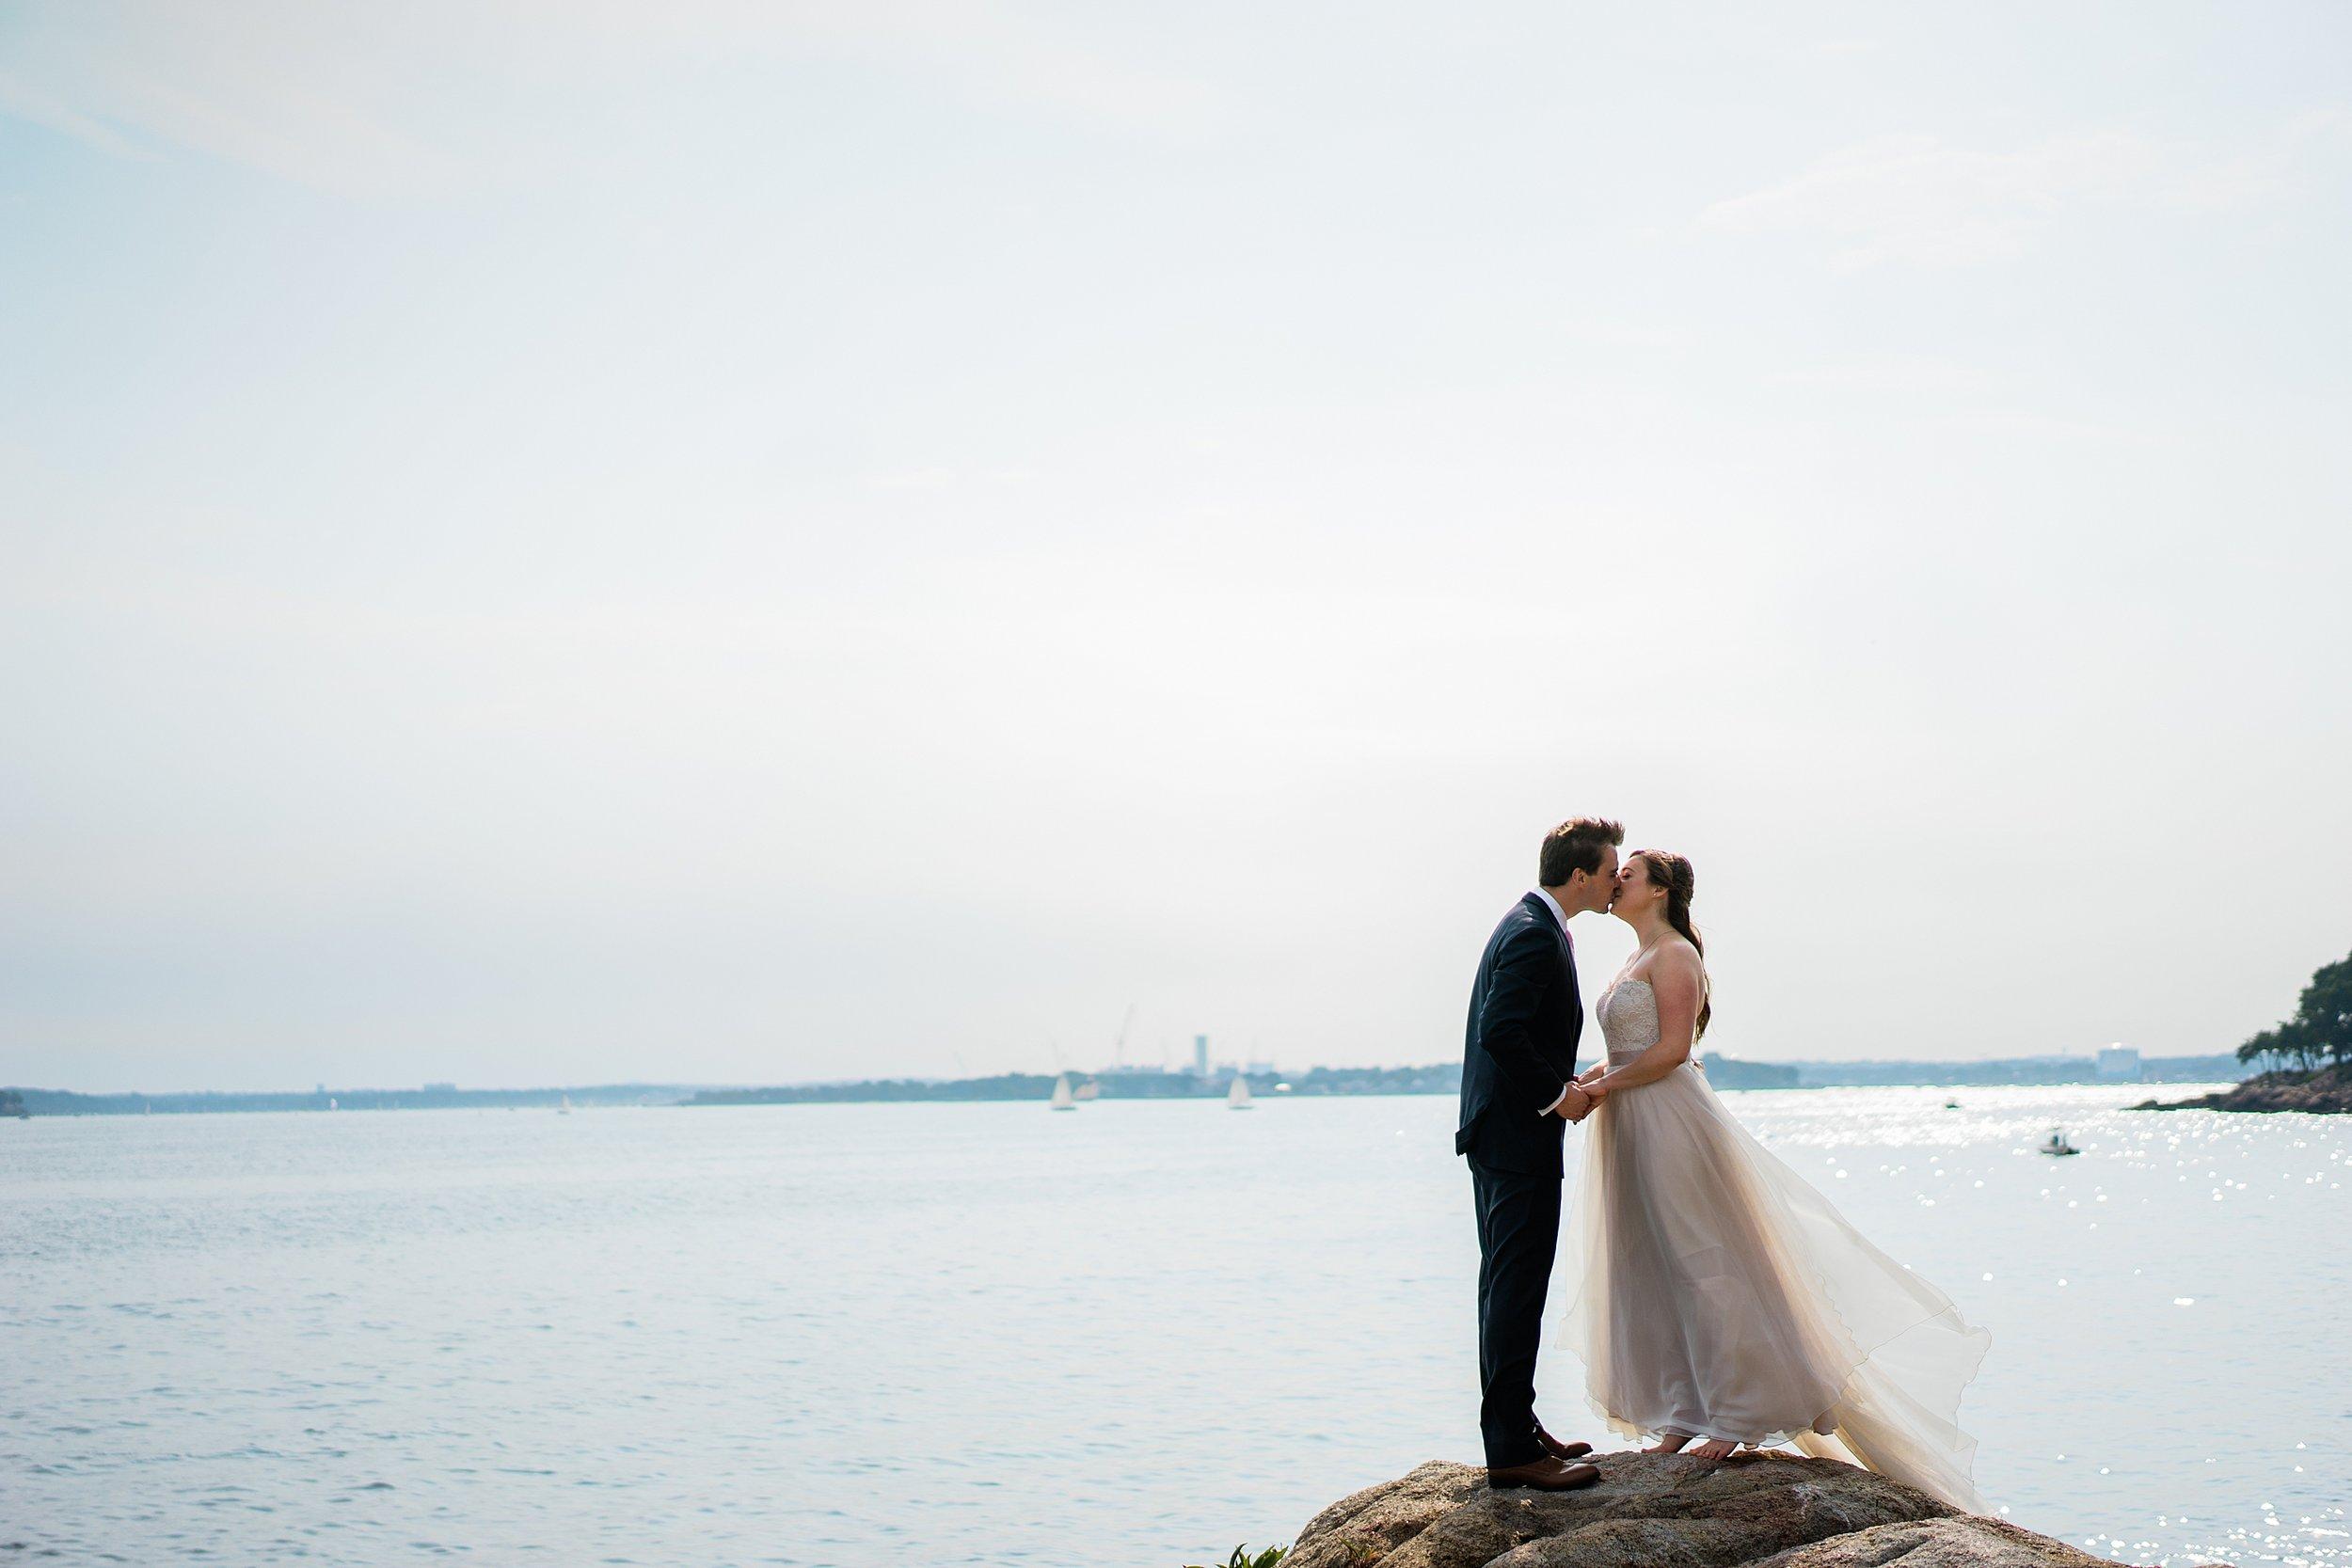 038 los angeles wedding photographer todd danforth photography boston.jpg